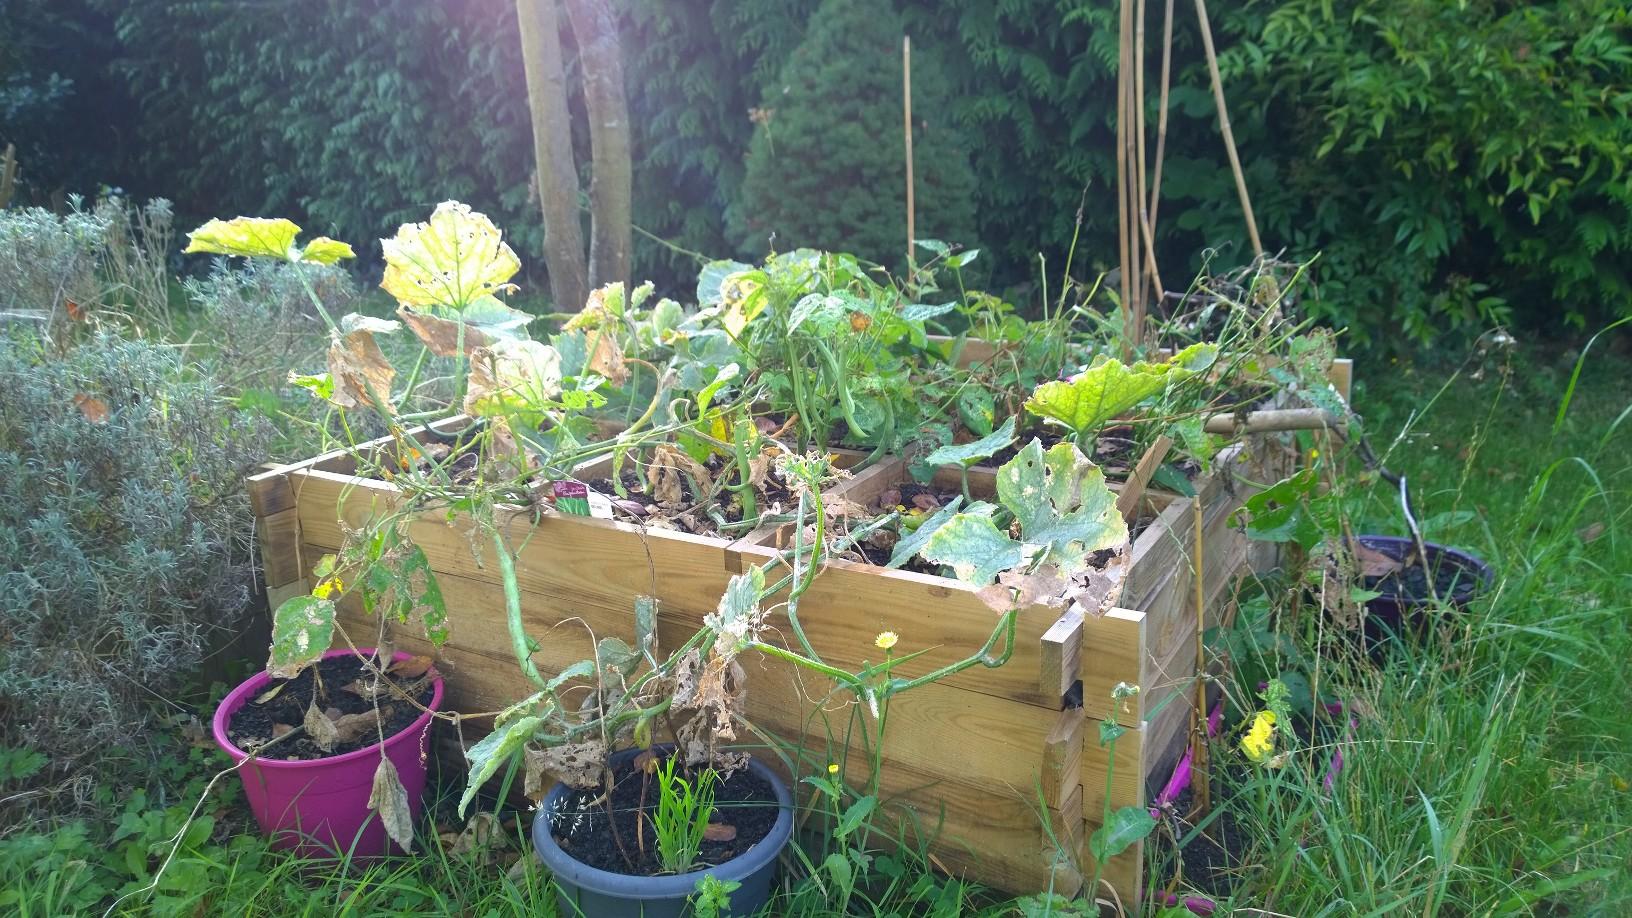 carre-potager-dans-jardin